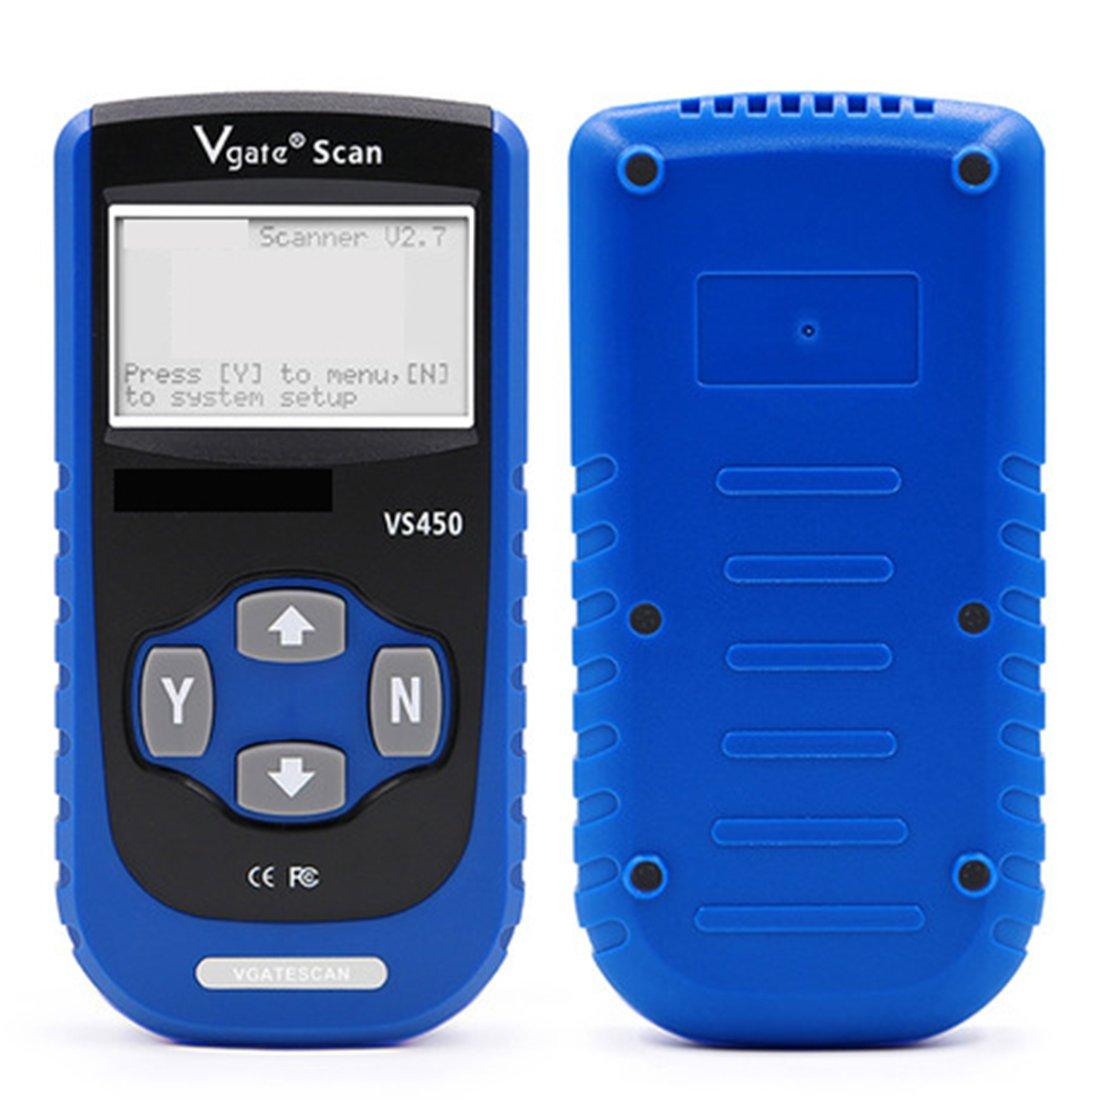 Buy Otc 3111 Obdiicanabsairbag Srs Scan Tool Otc 3111 Pro Obd2